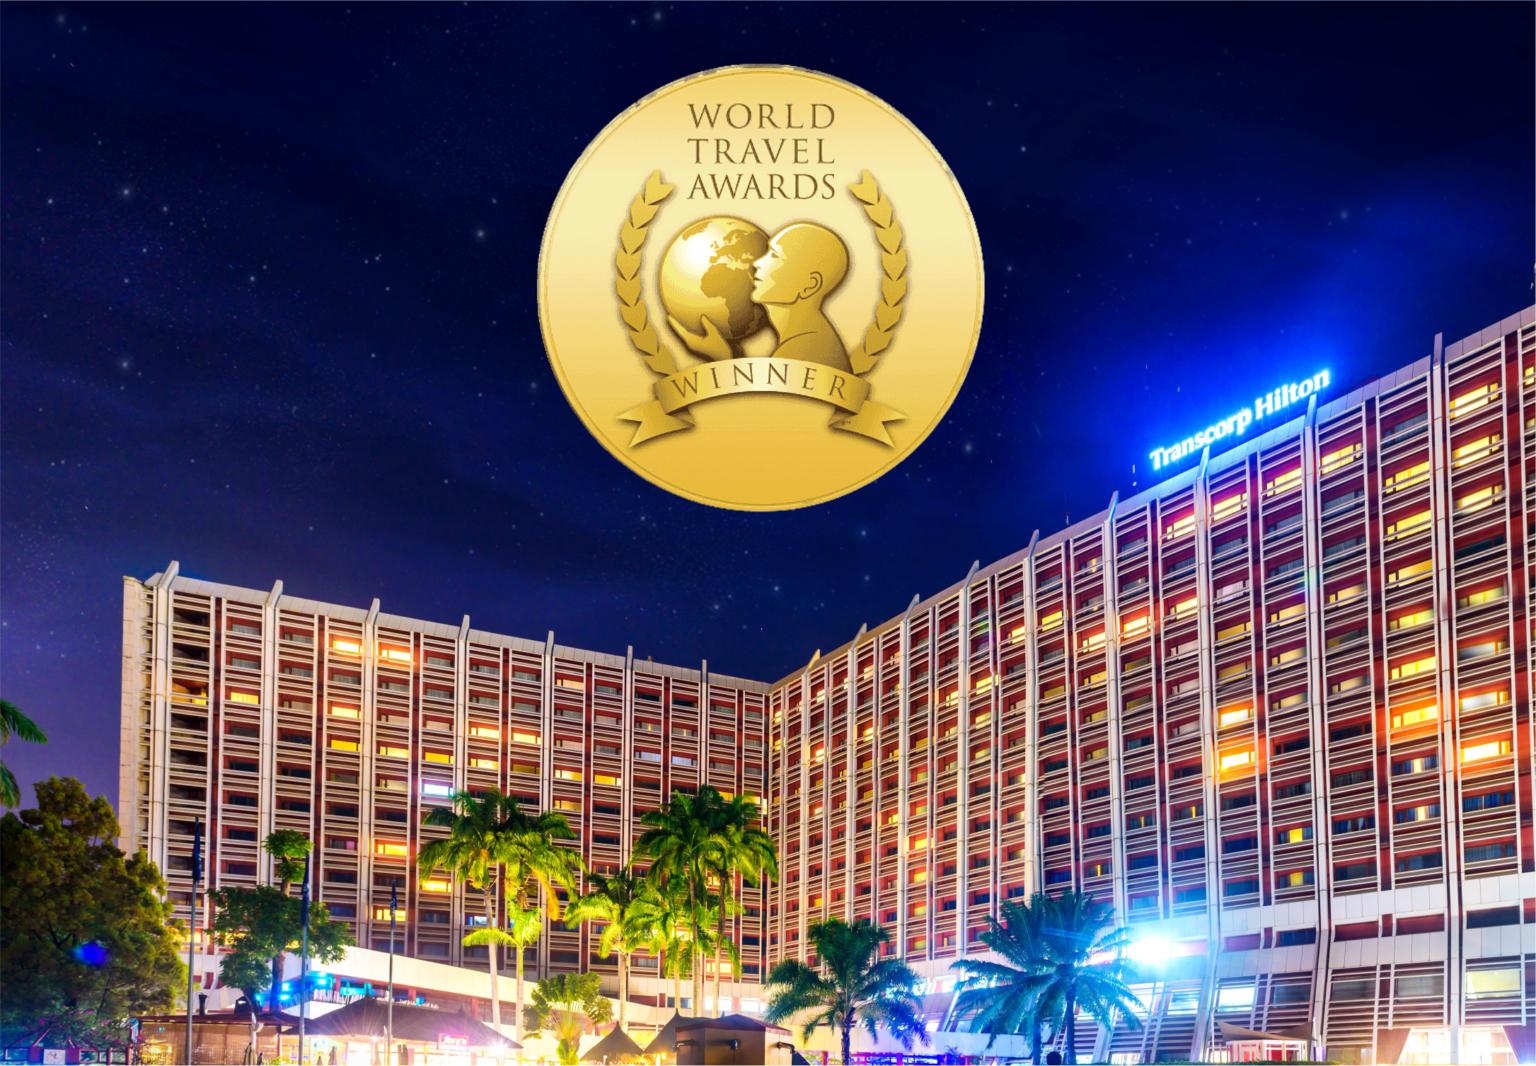 Transcorp Hilton Abuja wins big at the 2020 World Travel Awards.